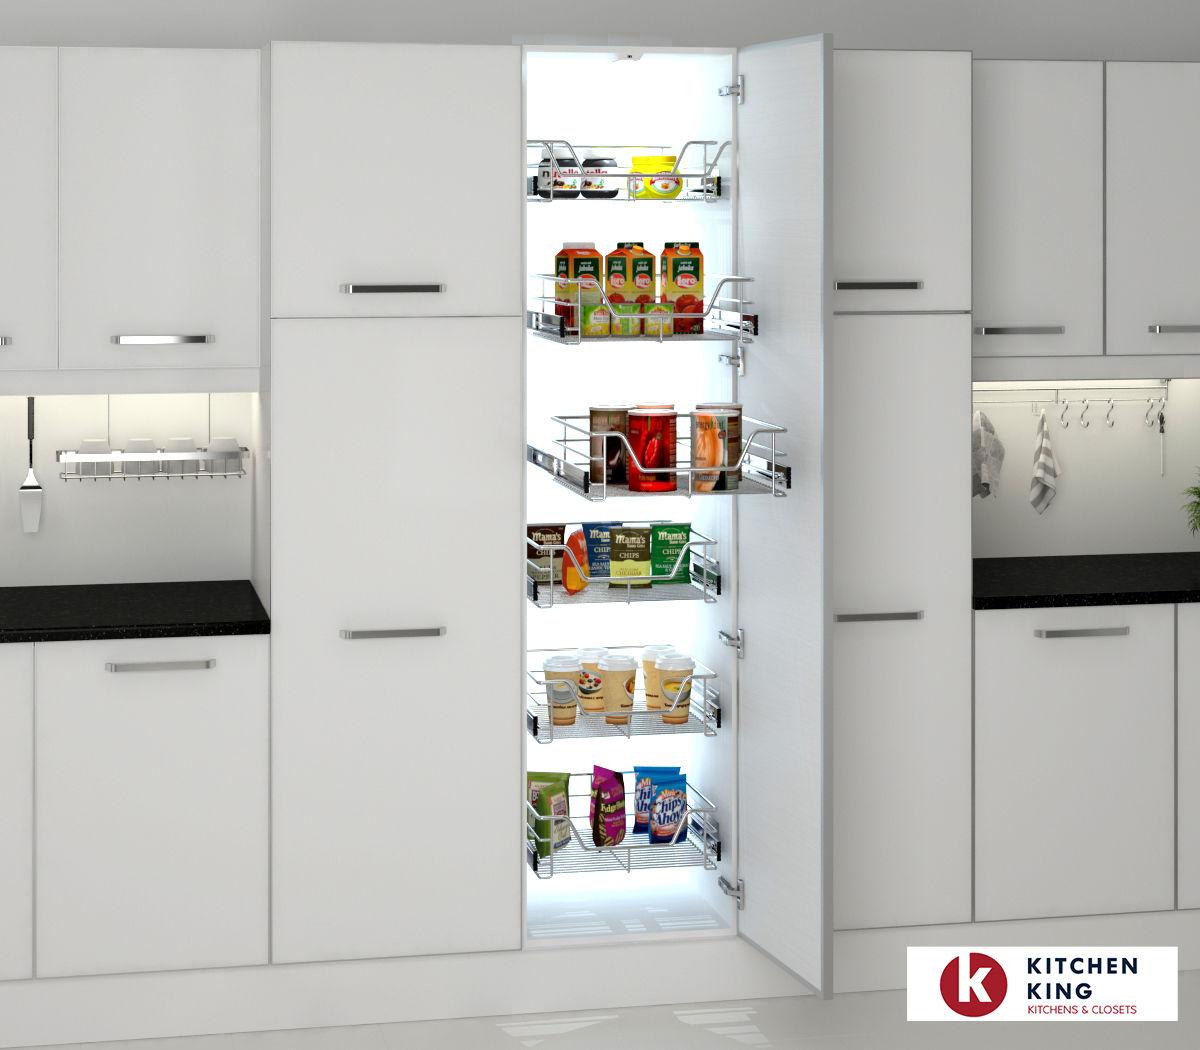 اكسسوارات مطابخ المنيوم from www.kitchenking.ae